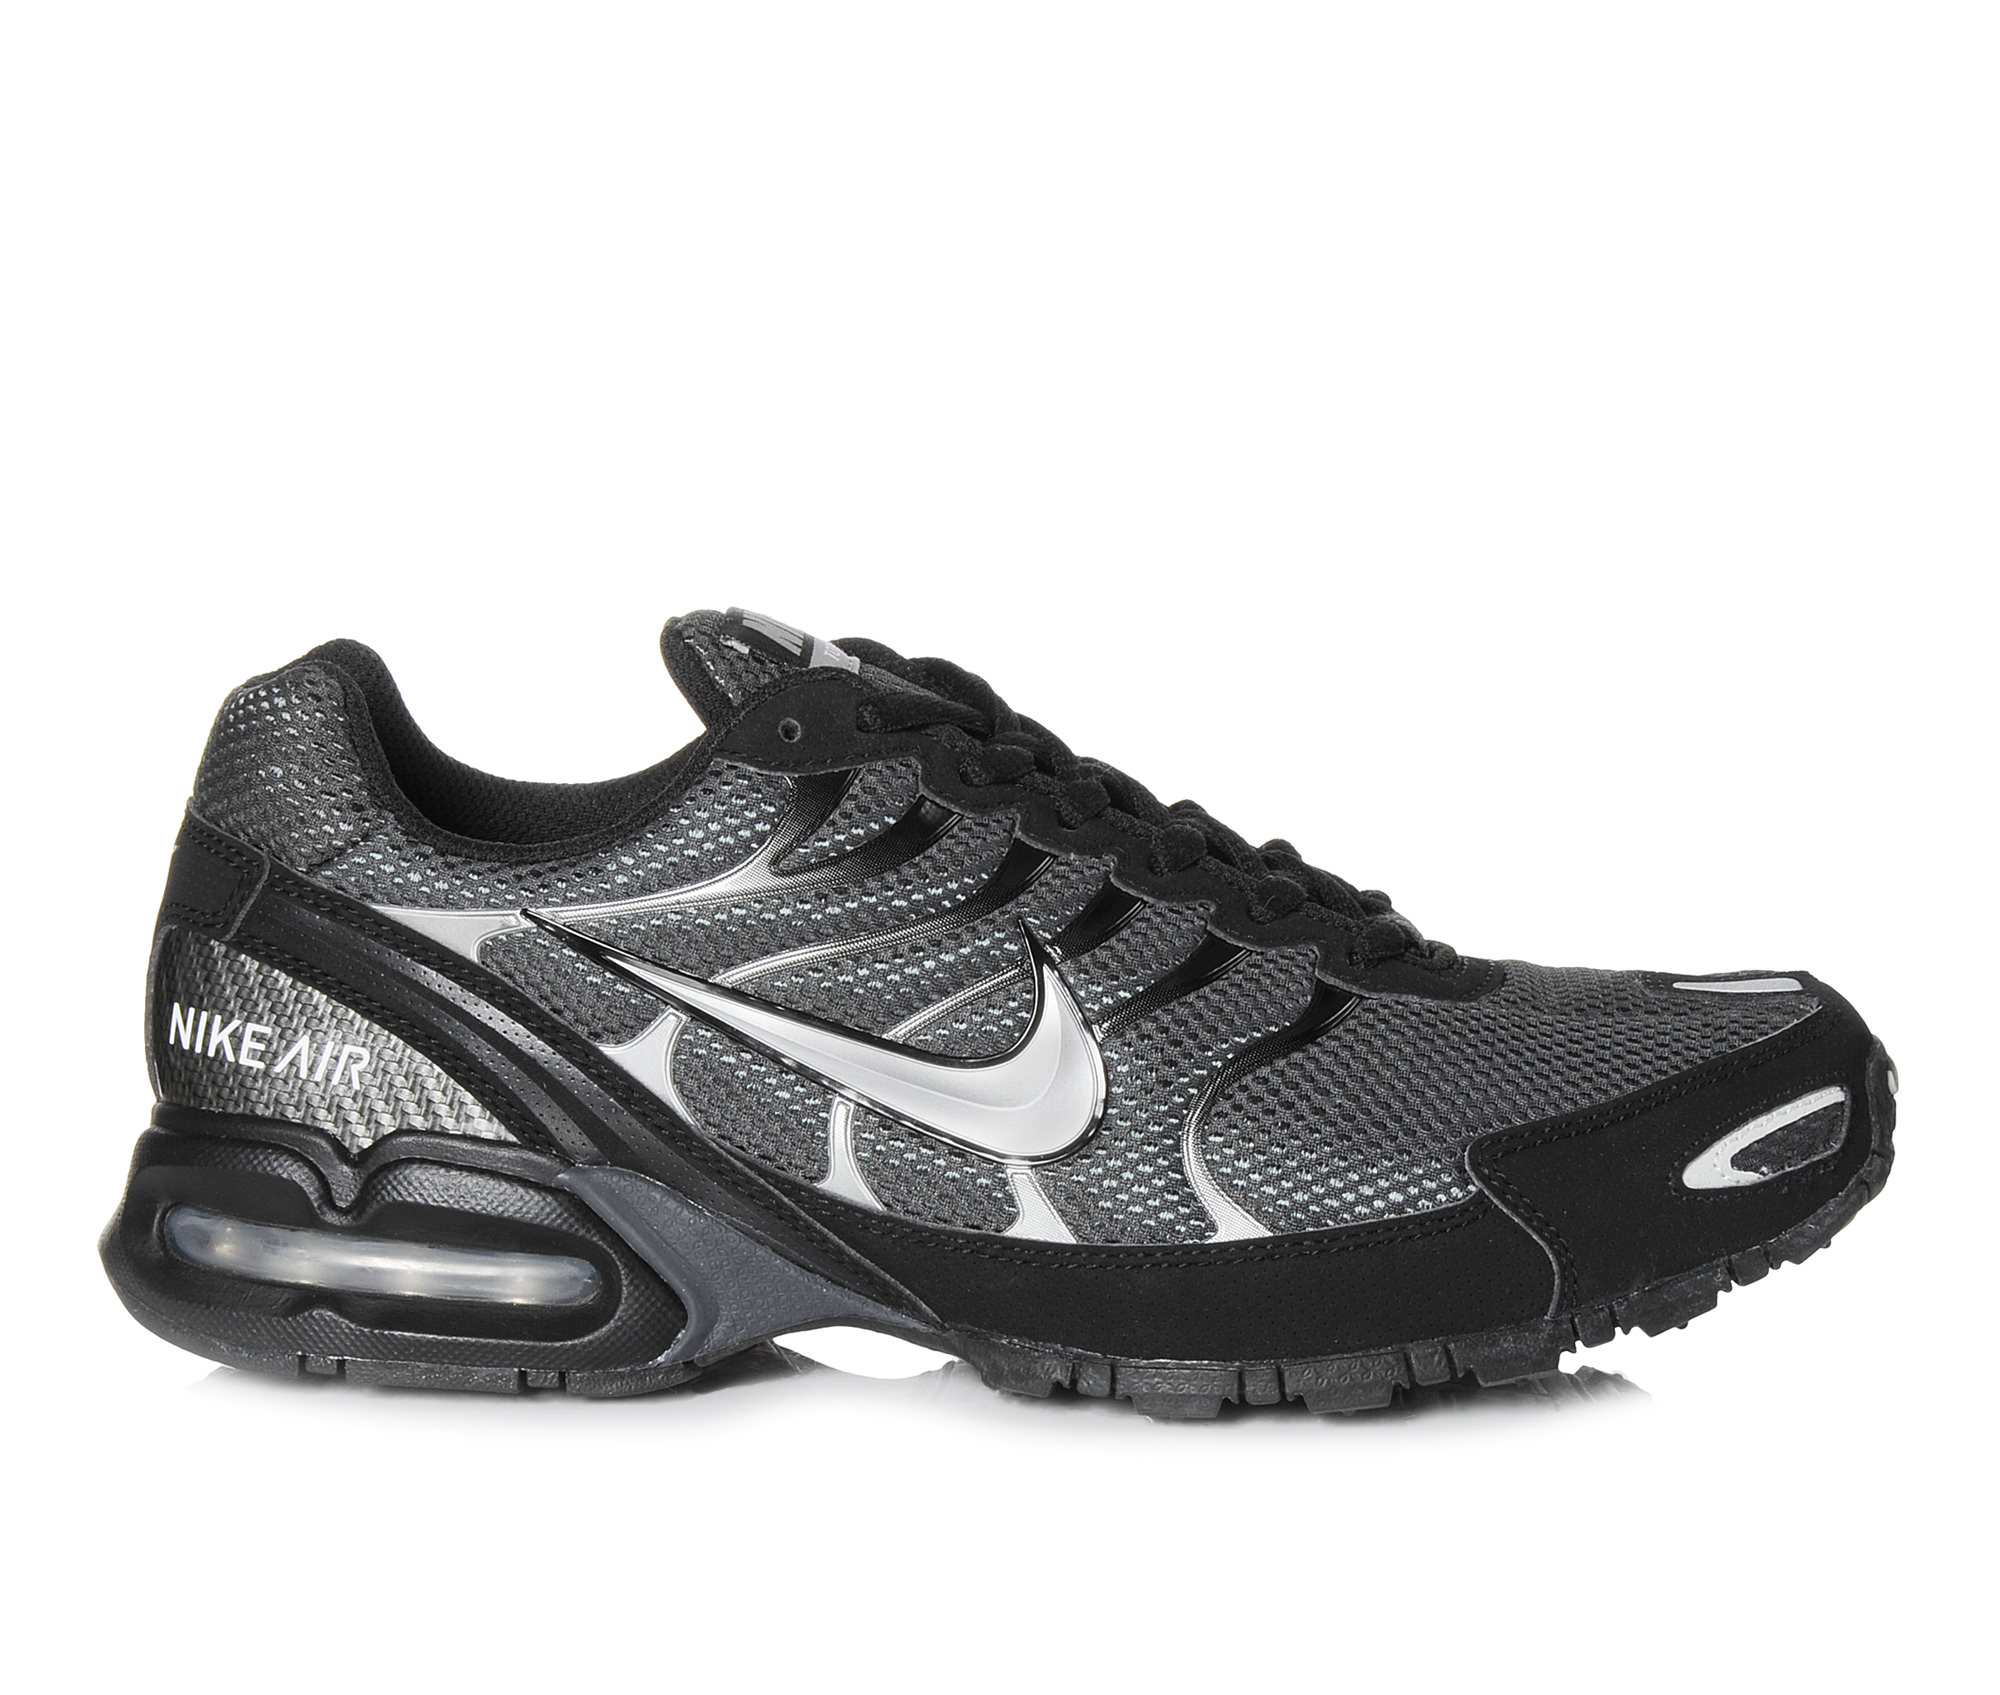 Catastrófico Conejo cada  Men's Nike Air Max Torch 4 Running Shoes